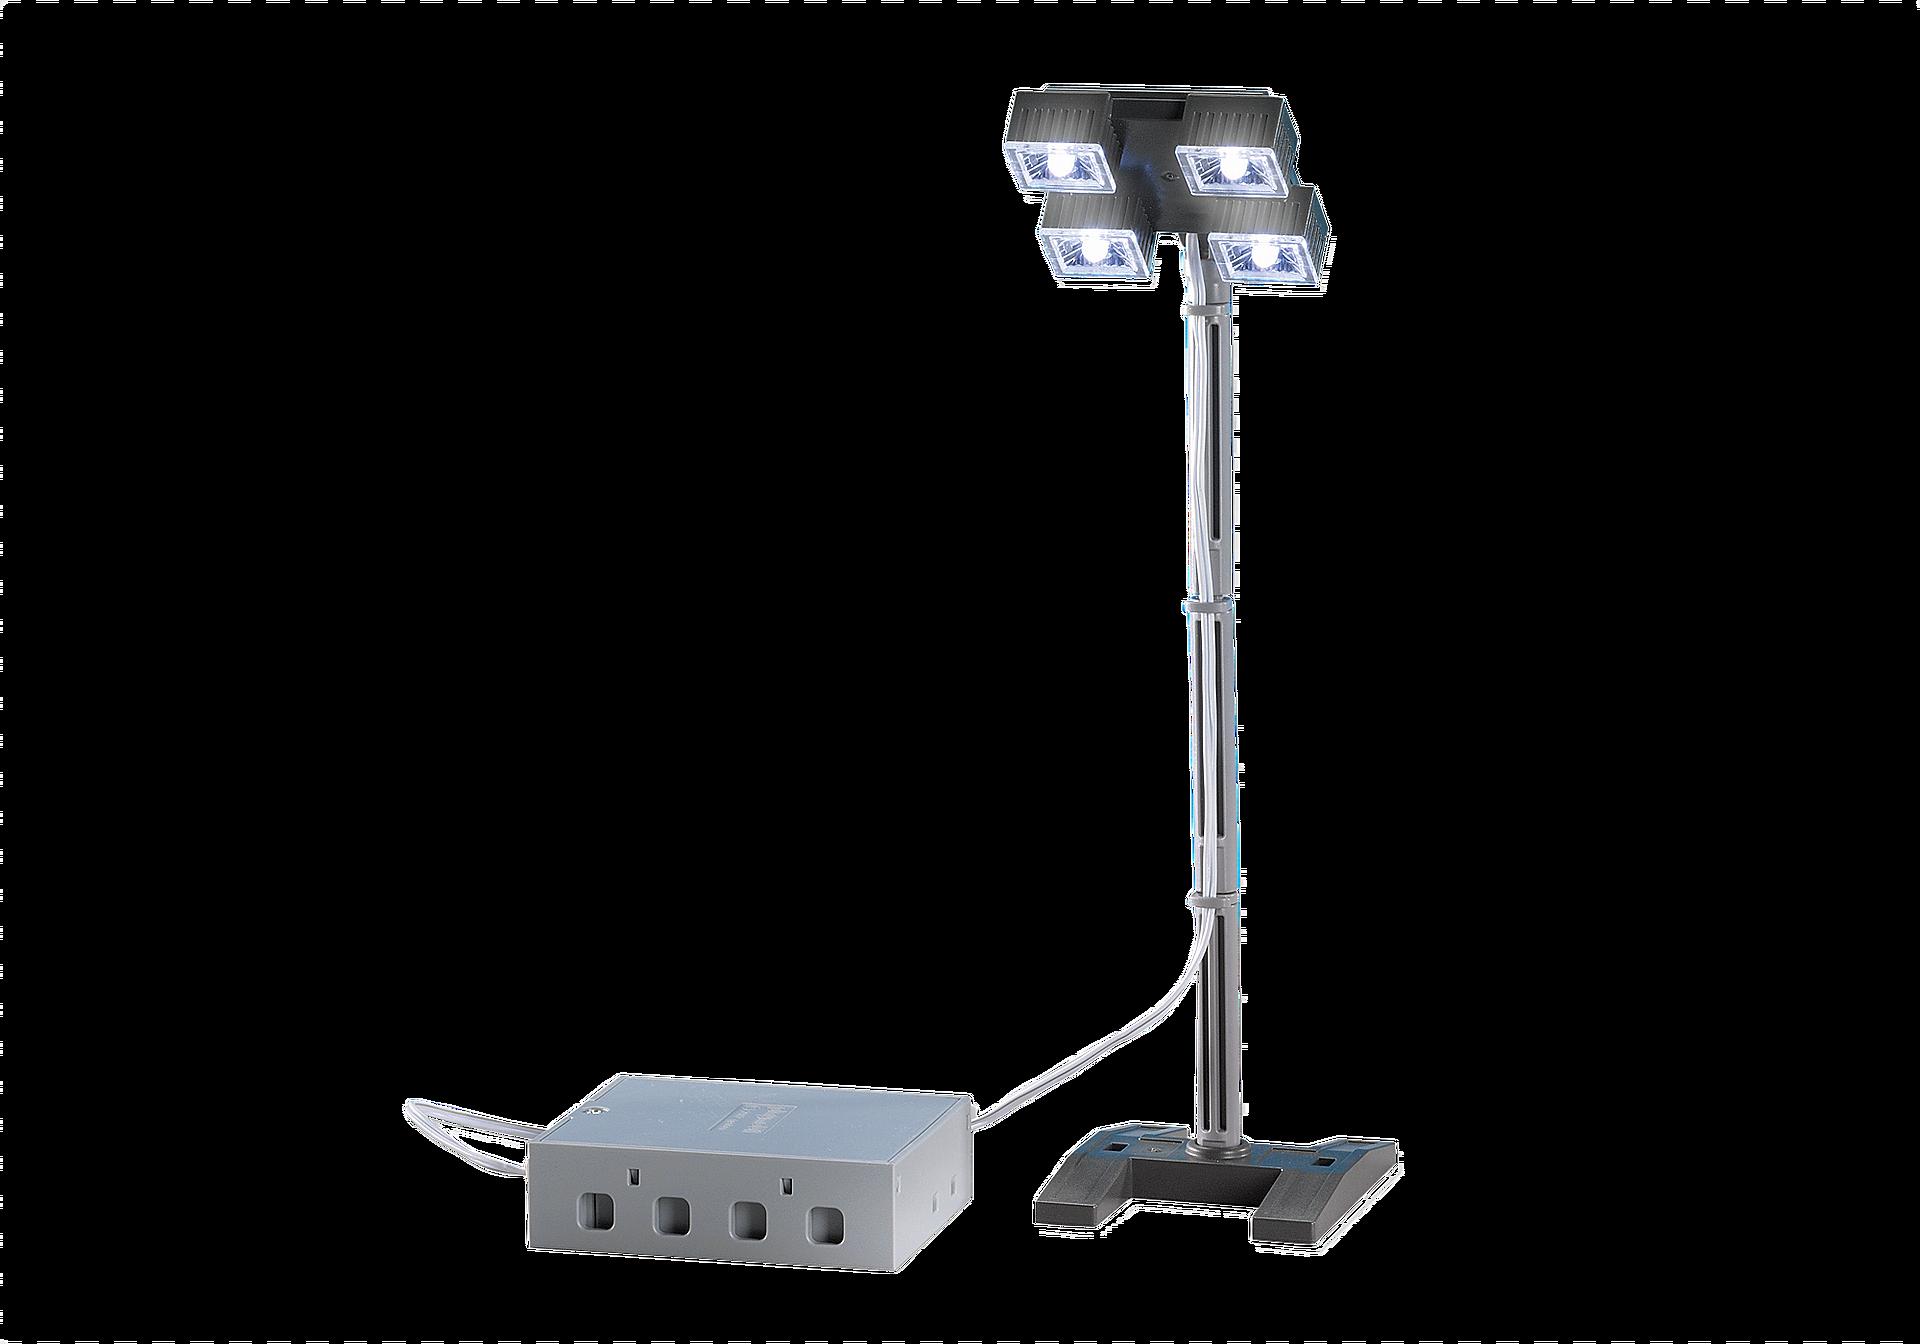 http://media.playmobil.com/i/playmobil/7445_product_detail/Proiettore di luce